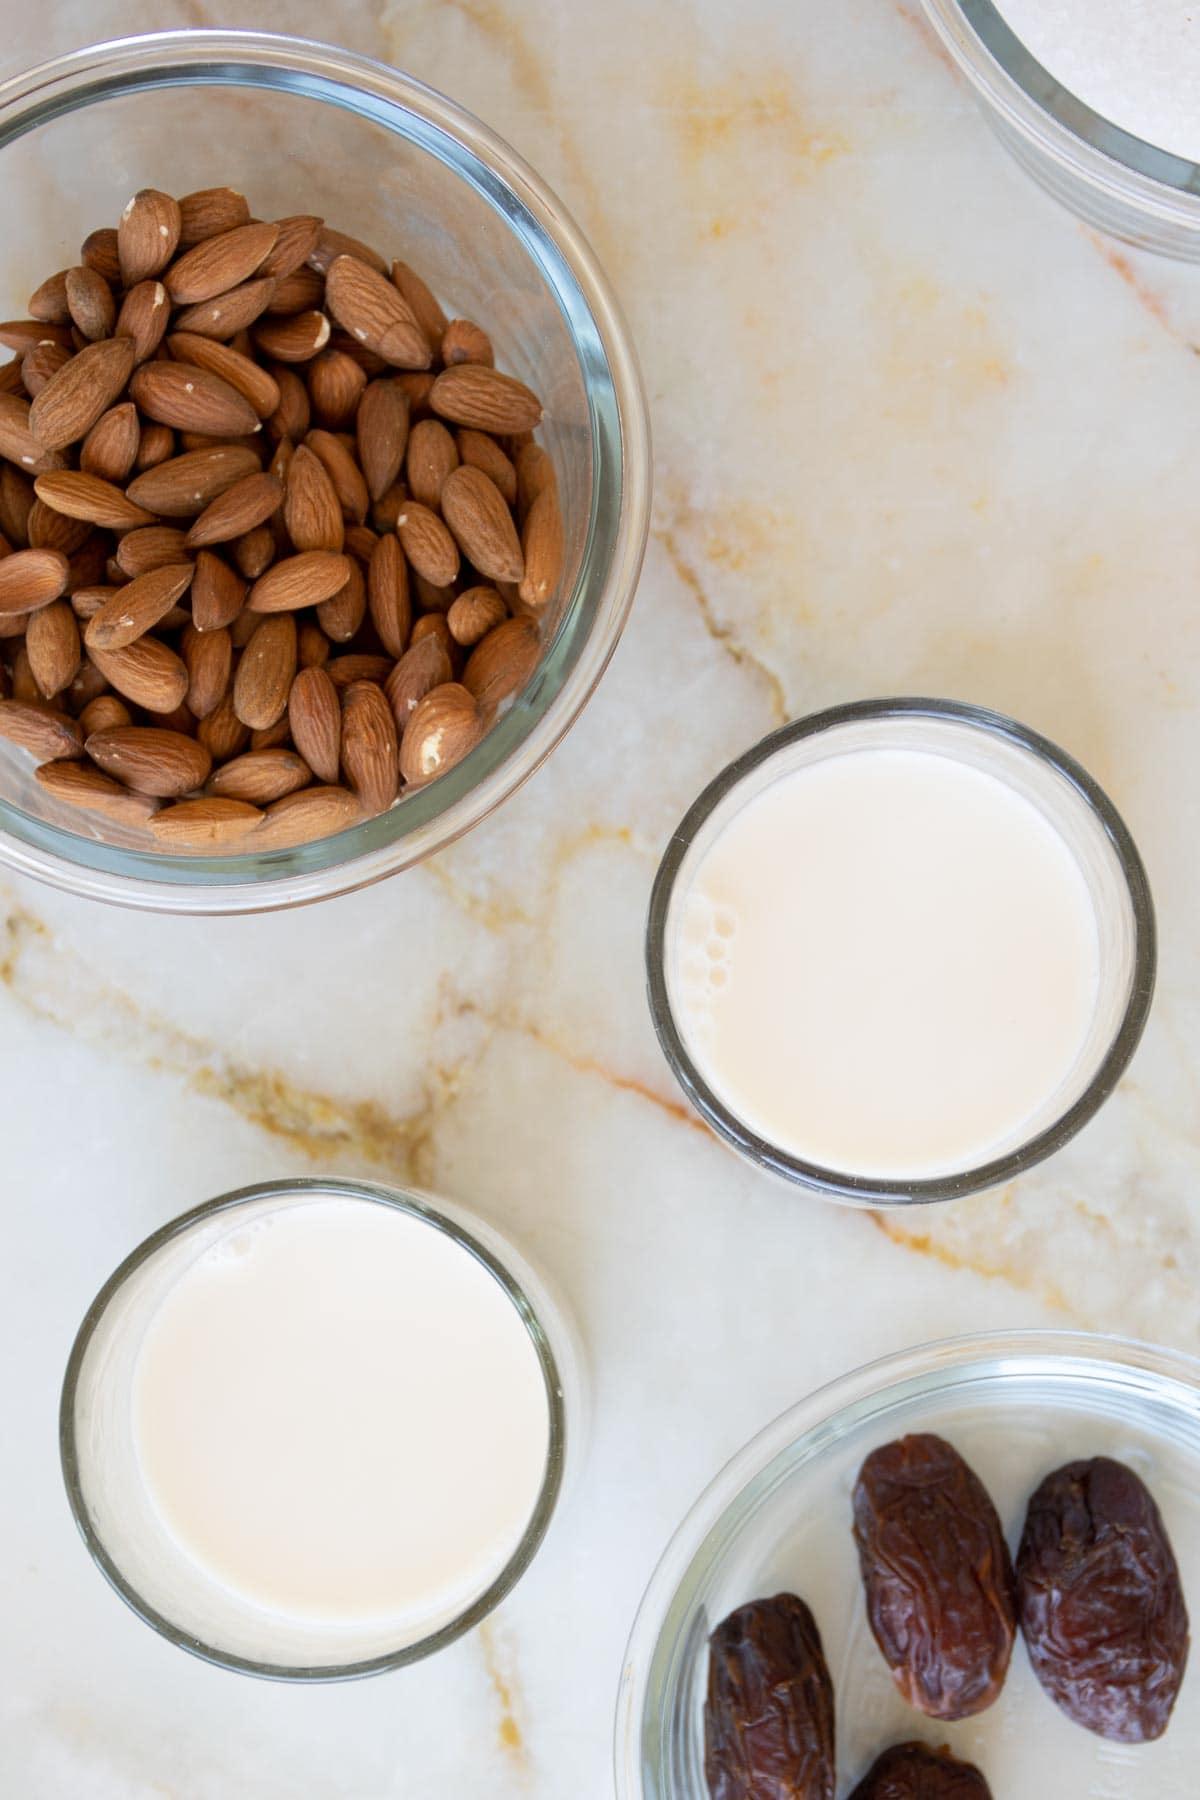 ingredients needed to make almond milk